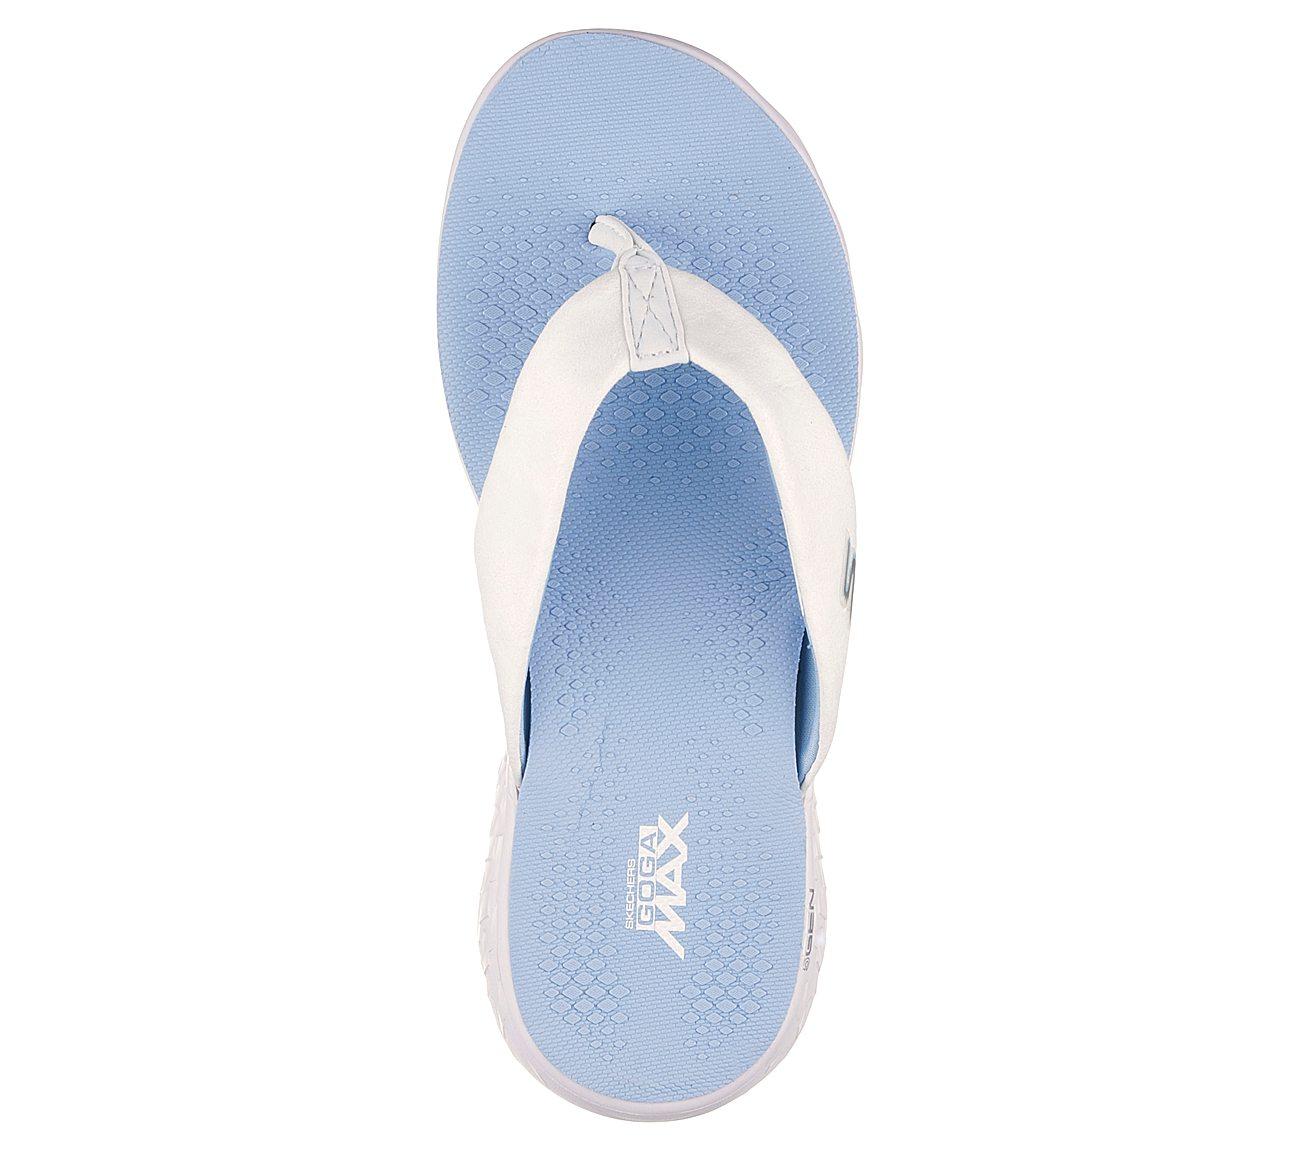 White//Light Blue Skechers Performance Women/'s On The Go 400 Essence Flip Flop